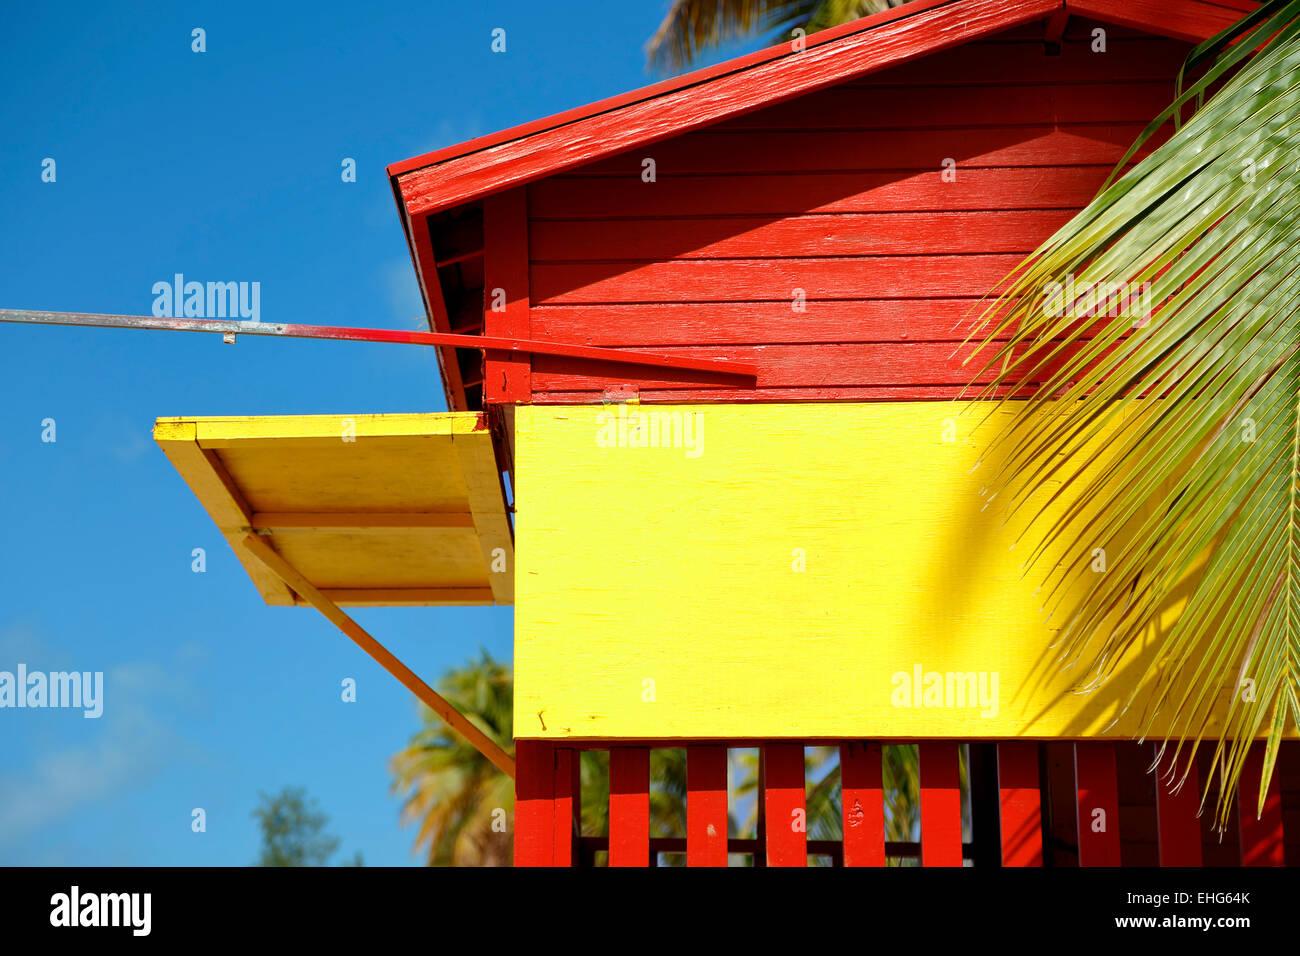 Lifeguard house, Luquillo Public Beach, Luquillo, Puerto Rico - Stock Image